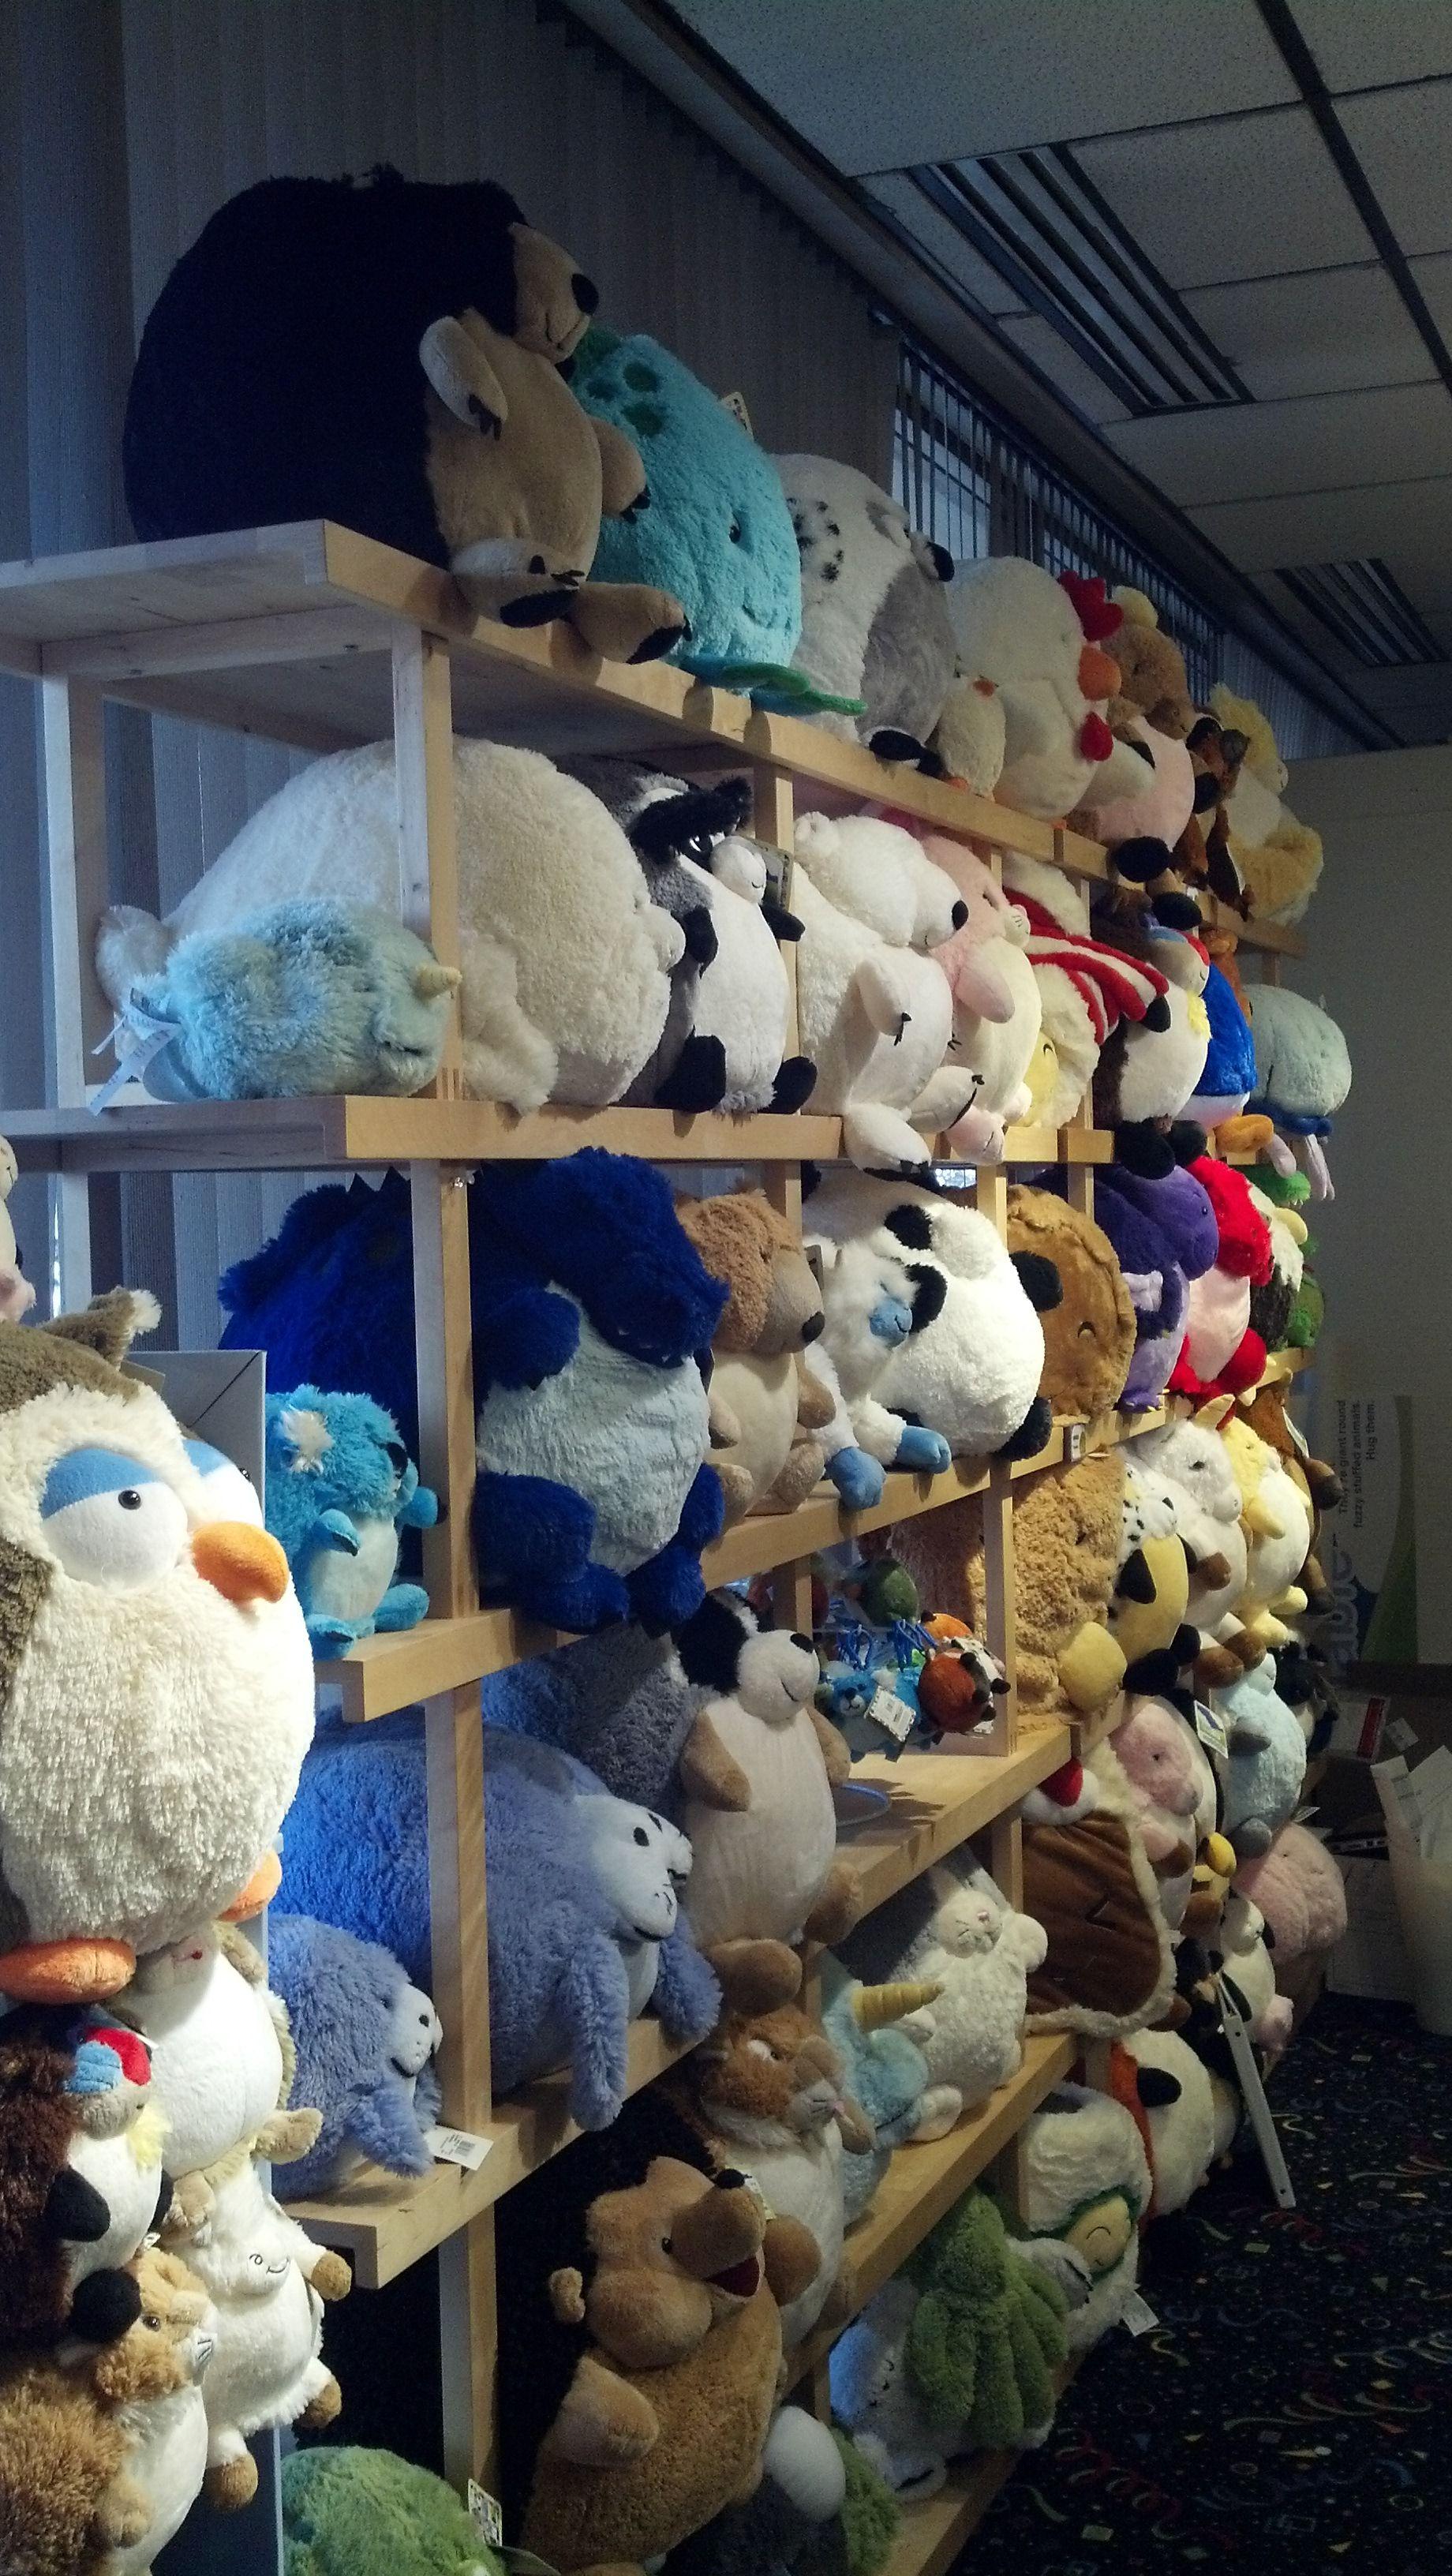 Squishable They Re Giant Round Fuzzy Stuffed Animals Hug Them Kawaii Plush Plush Plushies [ 3264 x 1840 Pixel ]